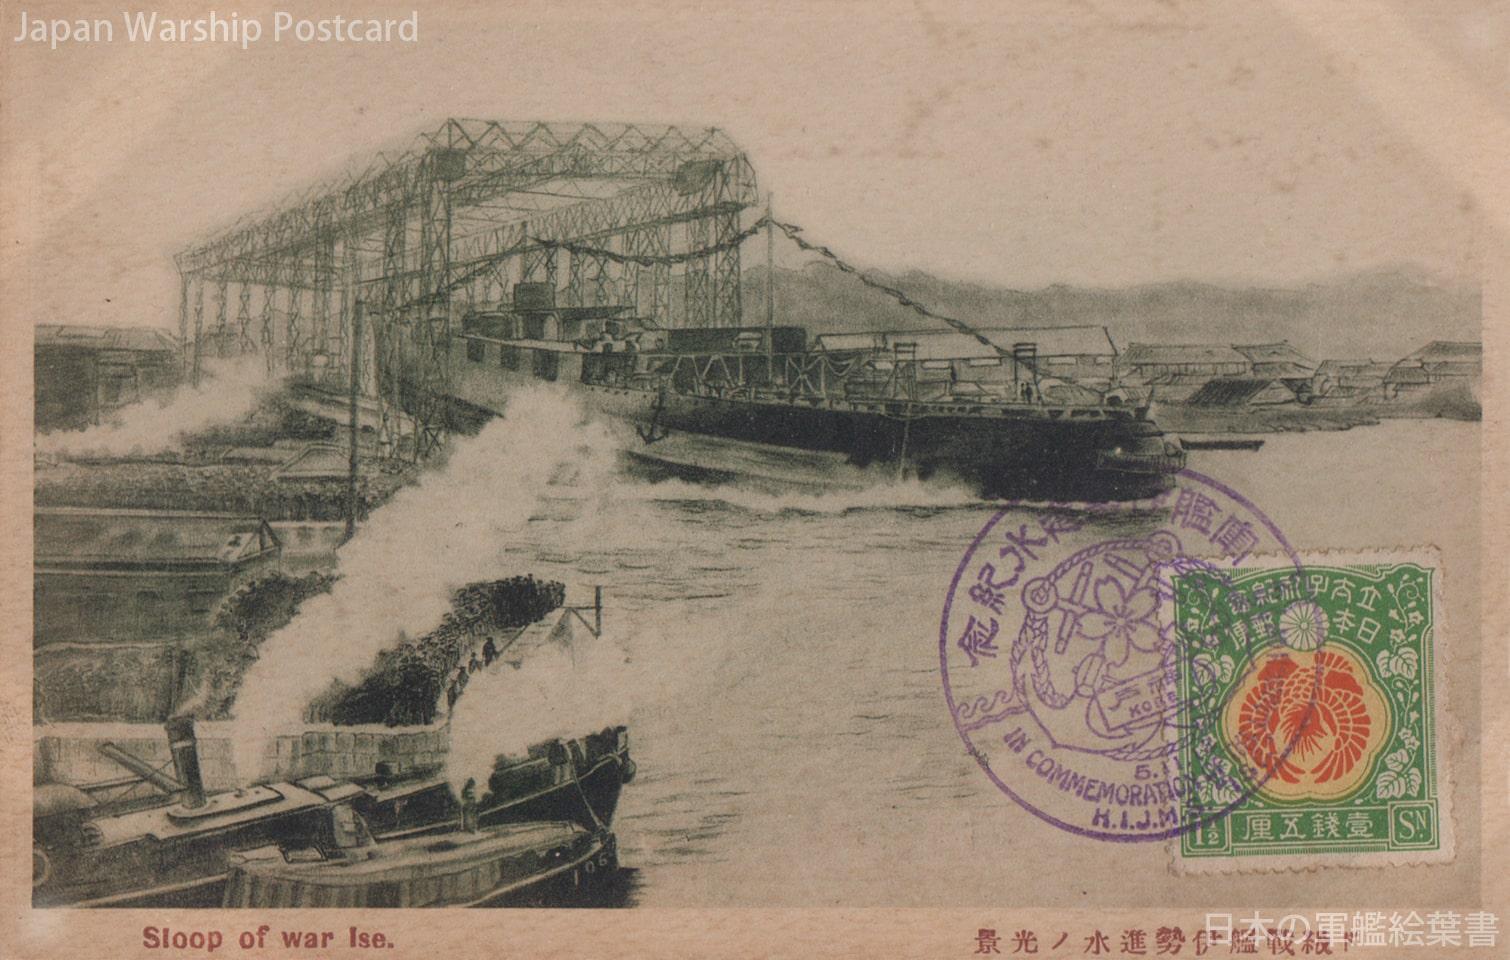 ド級戦艦伊勢進水ノ光景